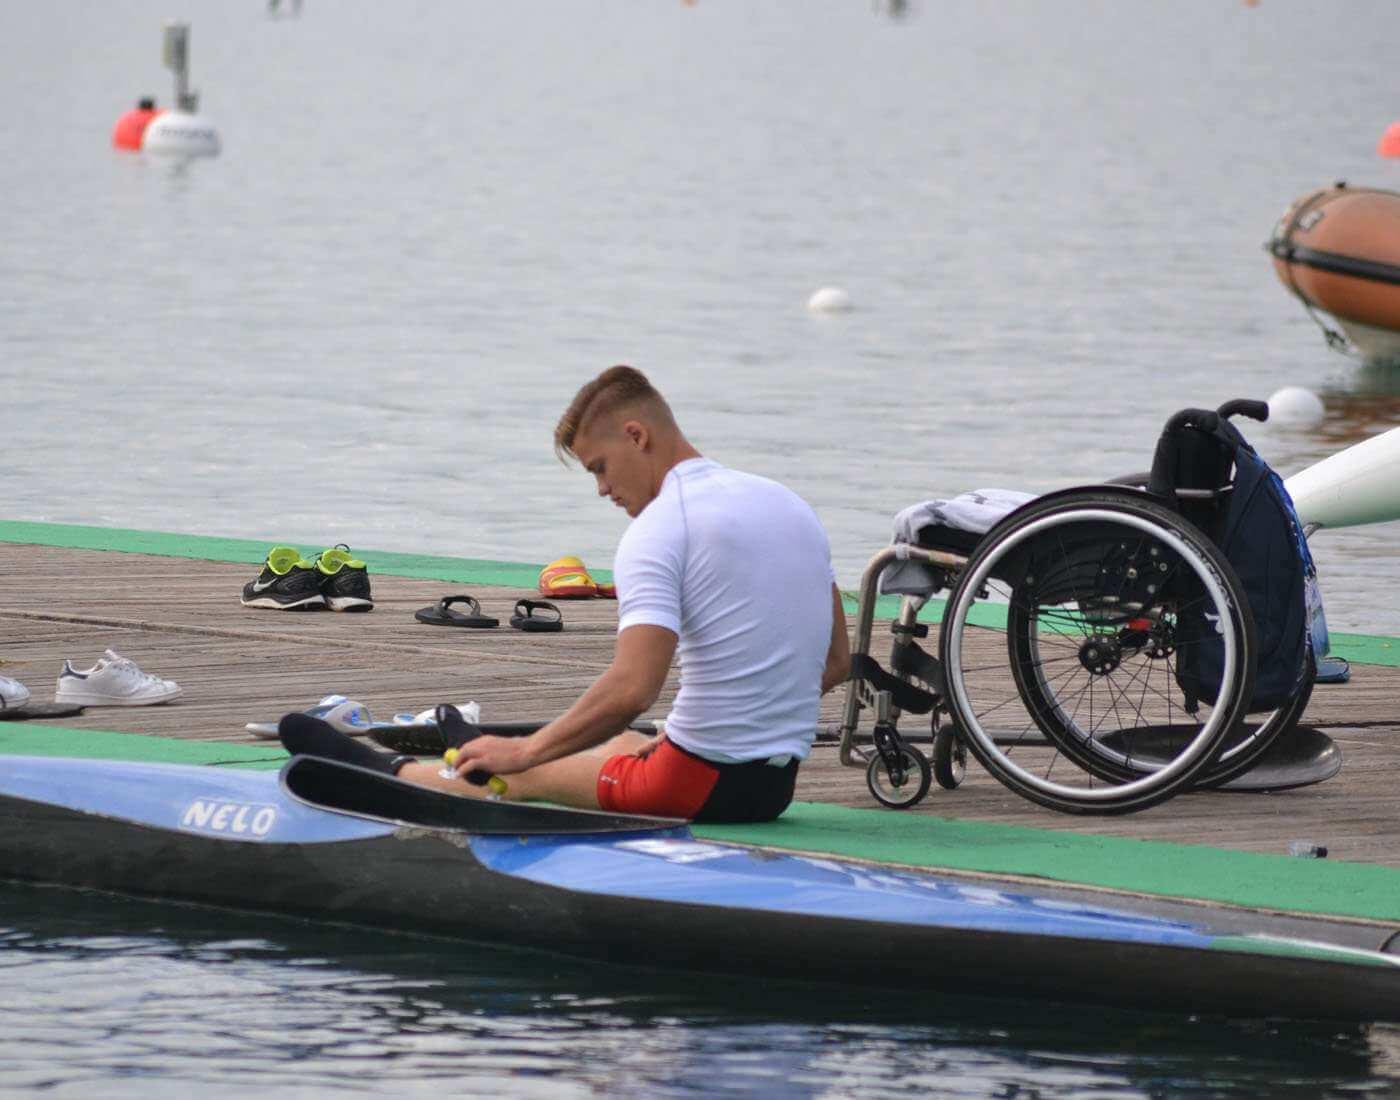 https://sportsmatik.com/uploads/matik-sports-corner/matik-know-how/para-canoe_1493817146_28455.jpg